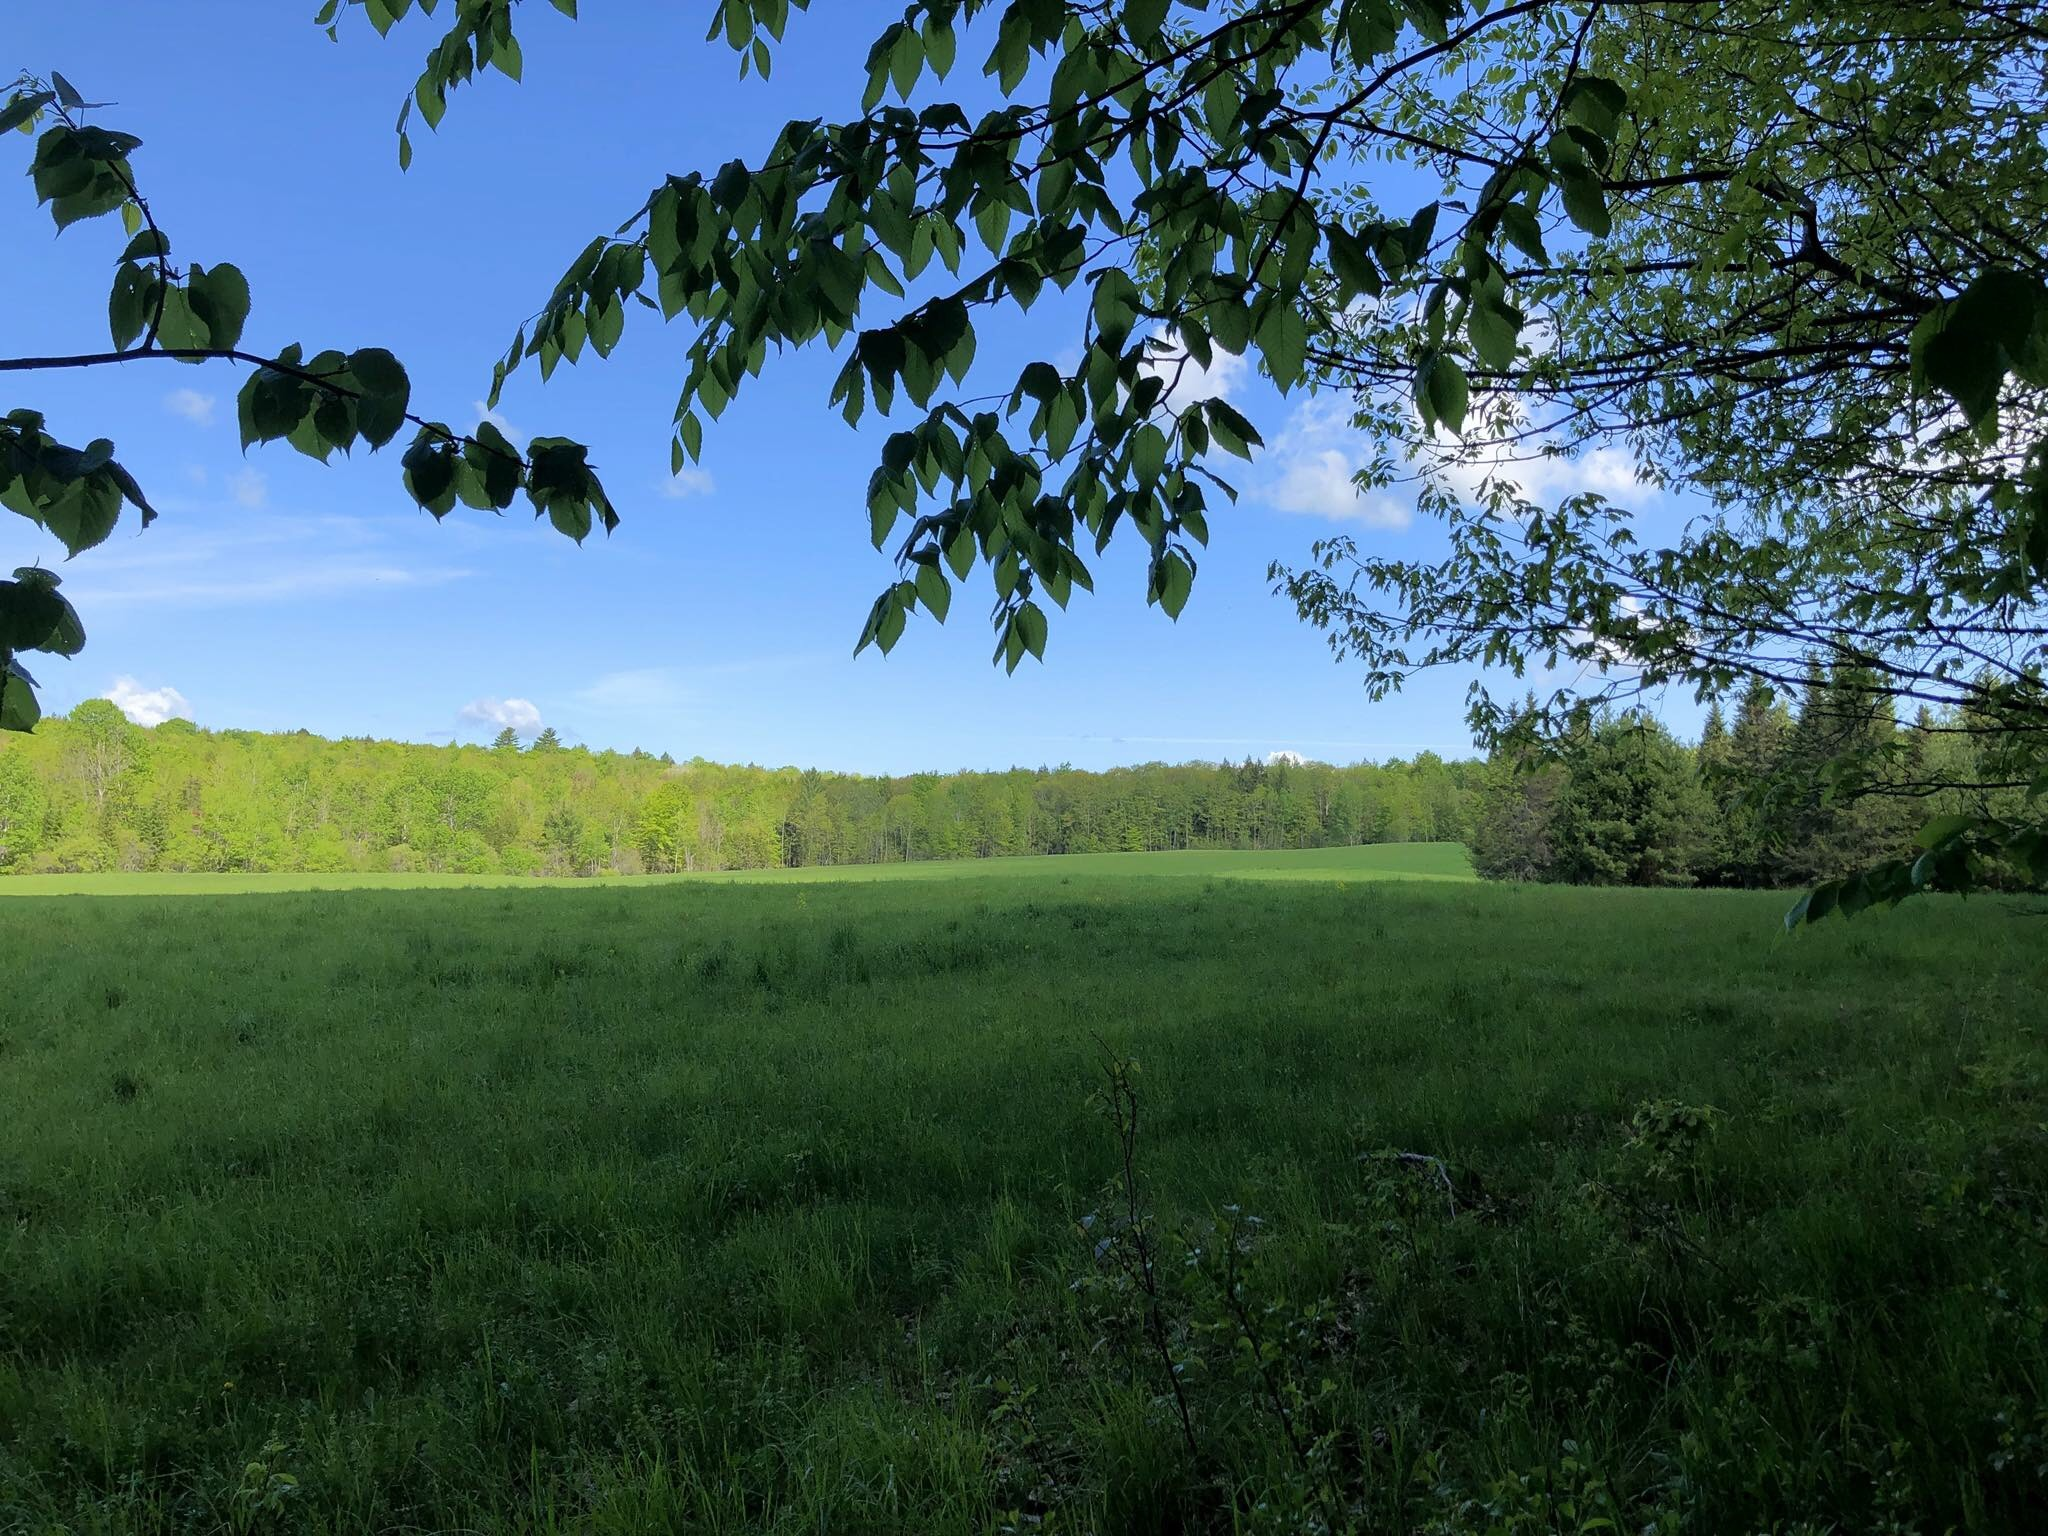 hayland